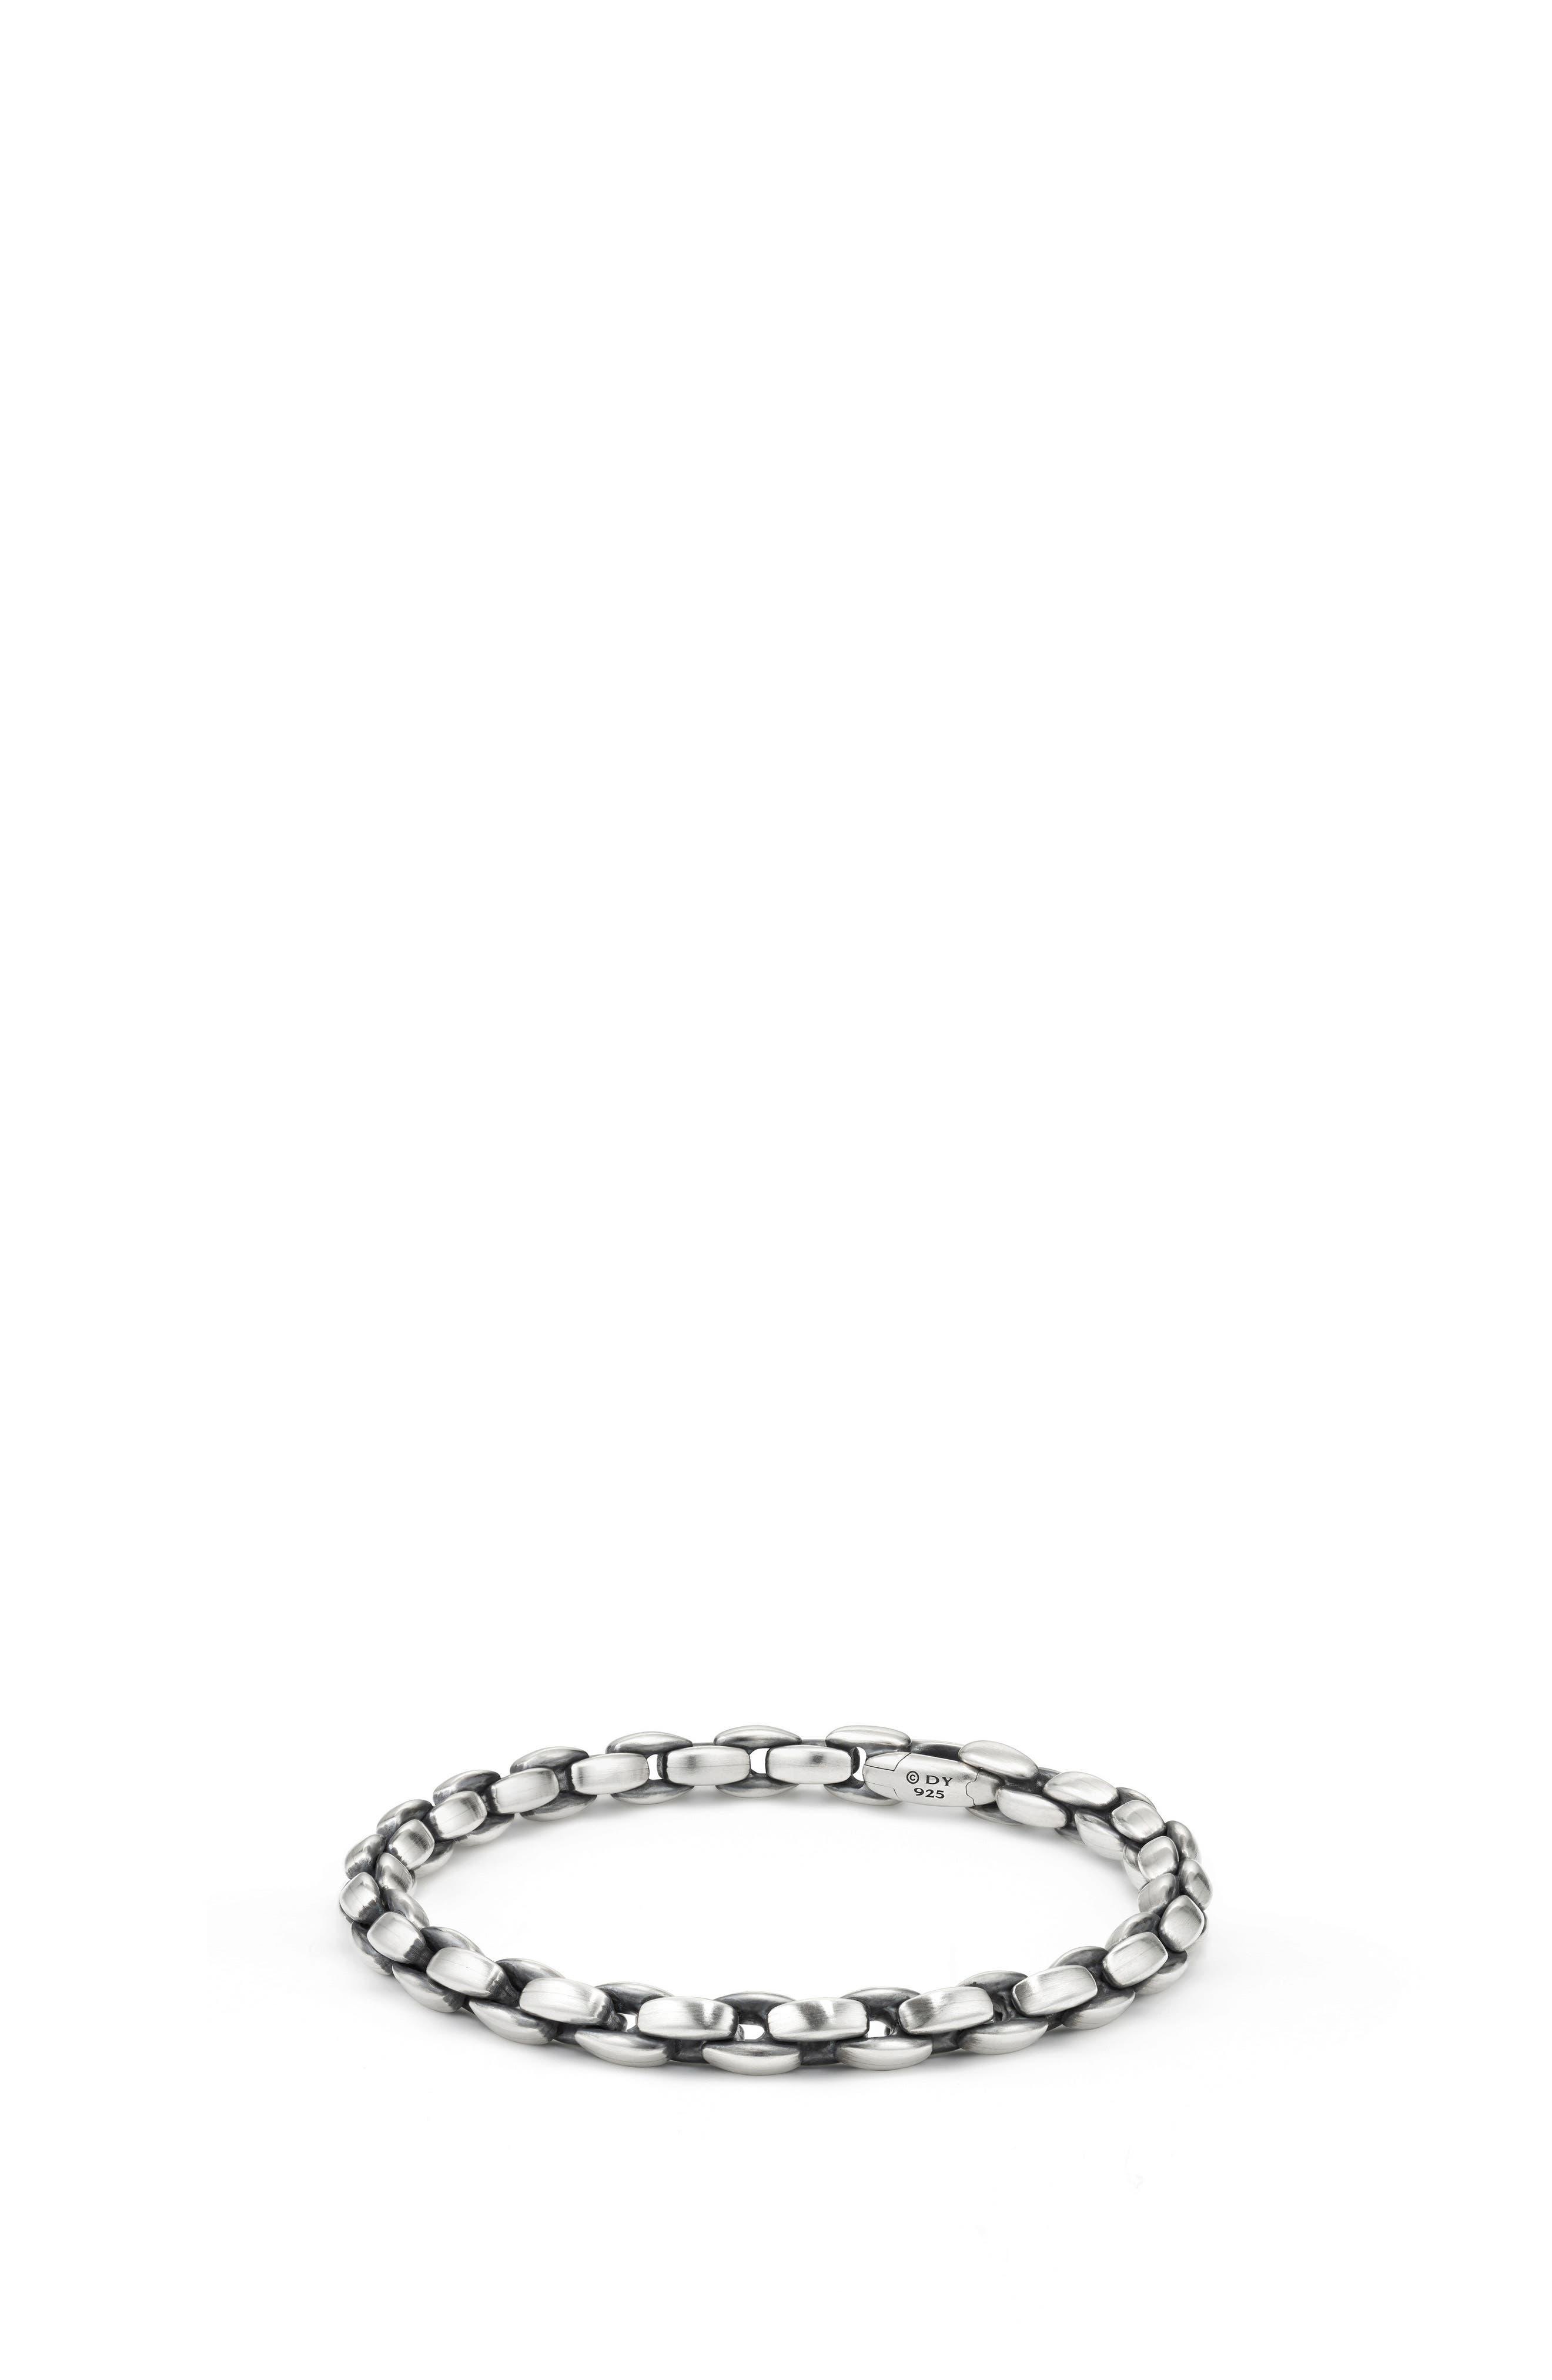 Main Image - David Yurman Elongated Box Chain Bracelet, 6mm